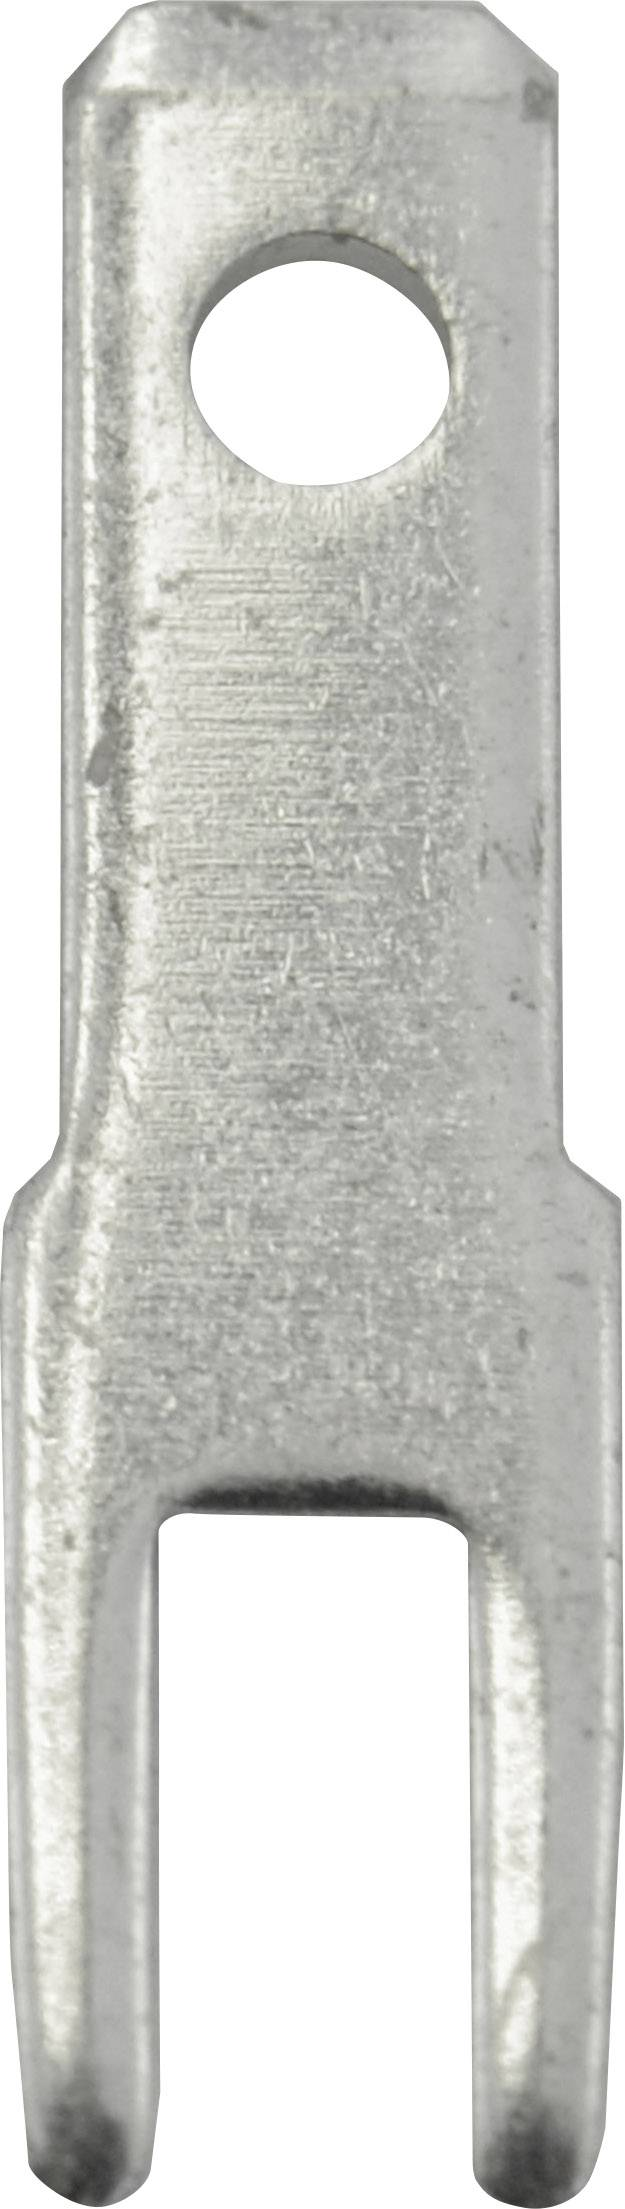 Faston zástrčka Vogt Verbindungstechnik 3785a08.68 2.8 mm x 0.8 mm, 180 °, bez izolace, kov, 100 ks